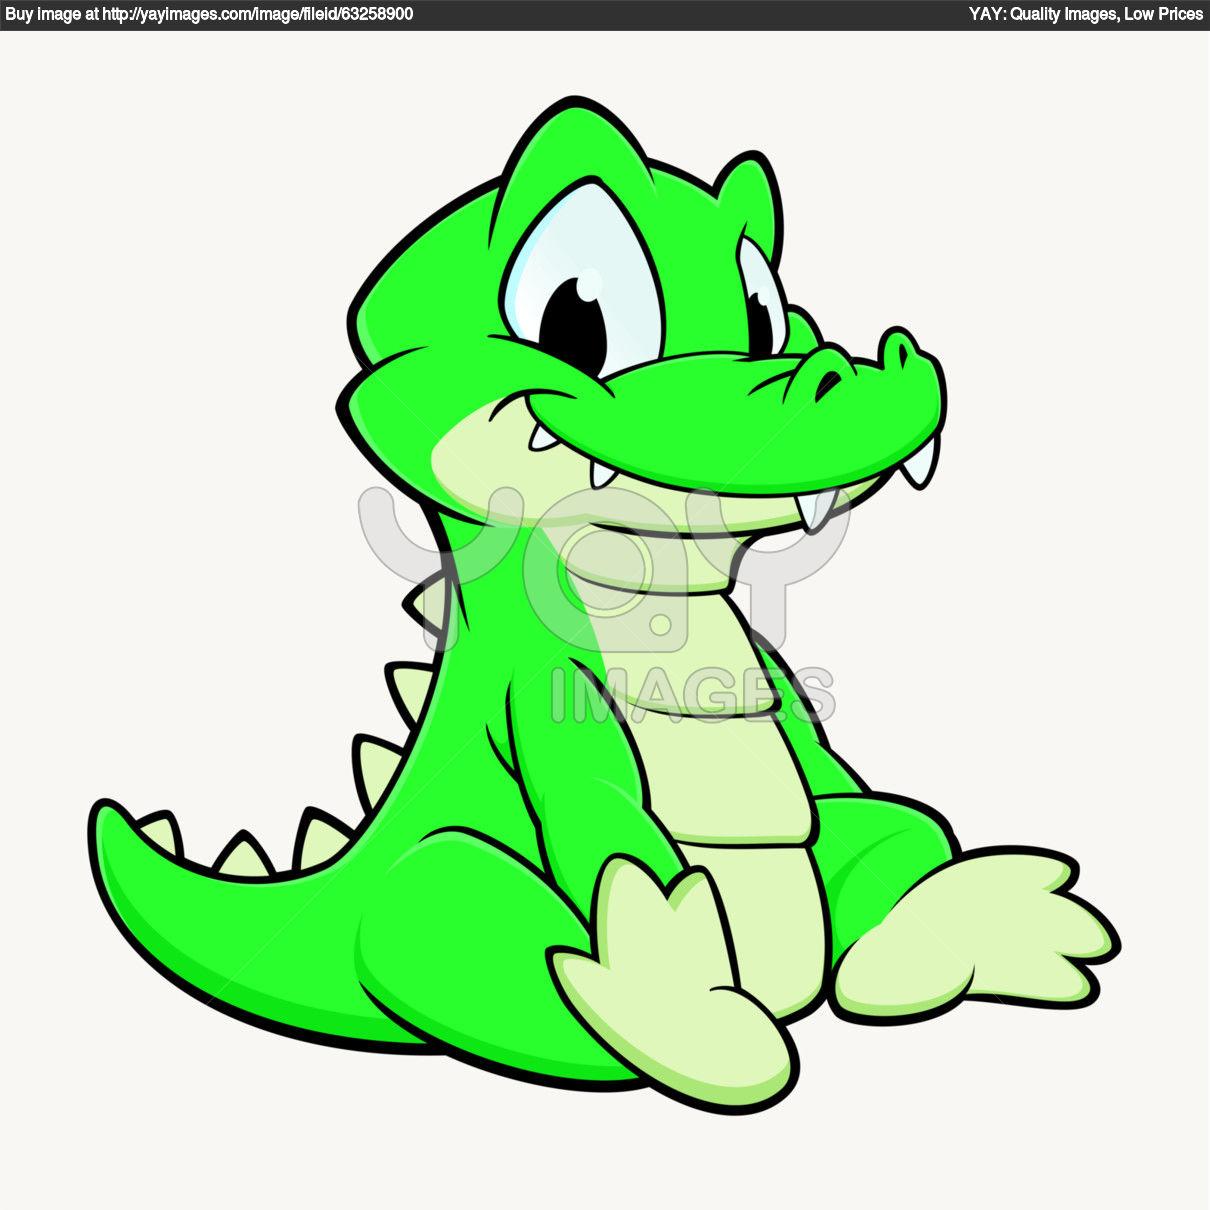 1210x1210 Crocodile Clipart, Suggestions For Crocodile Clipart, Download